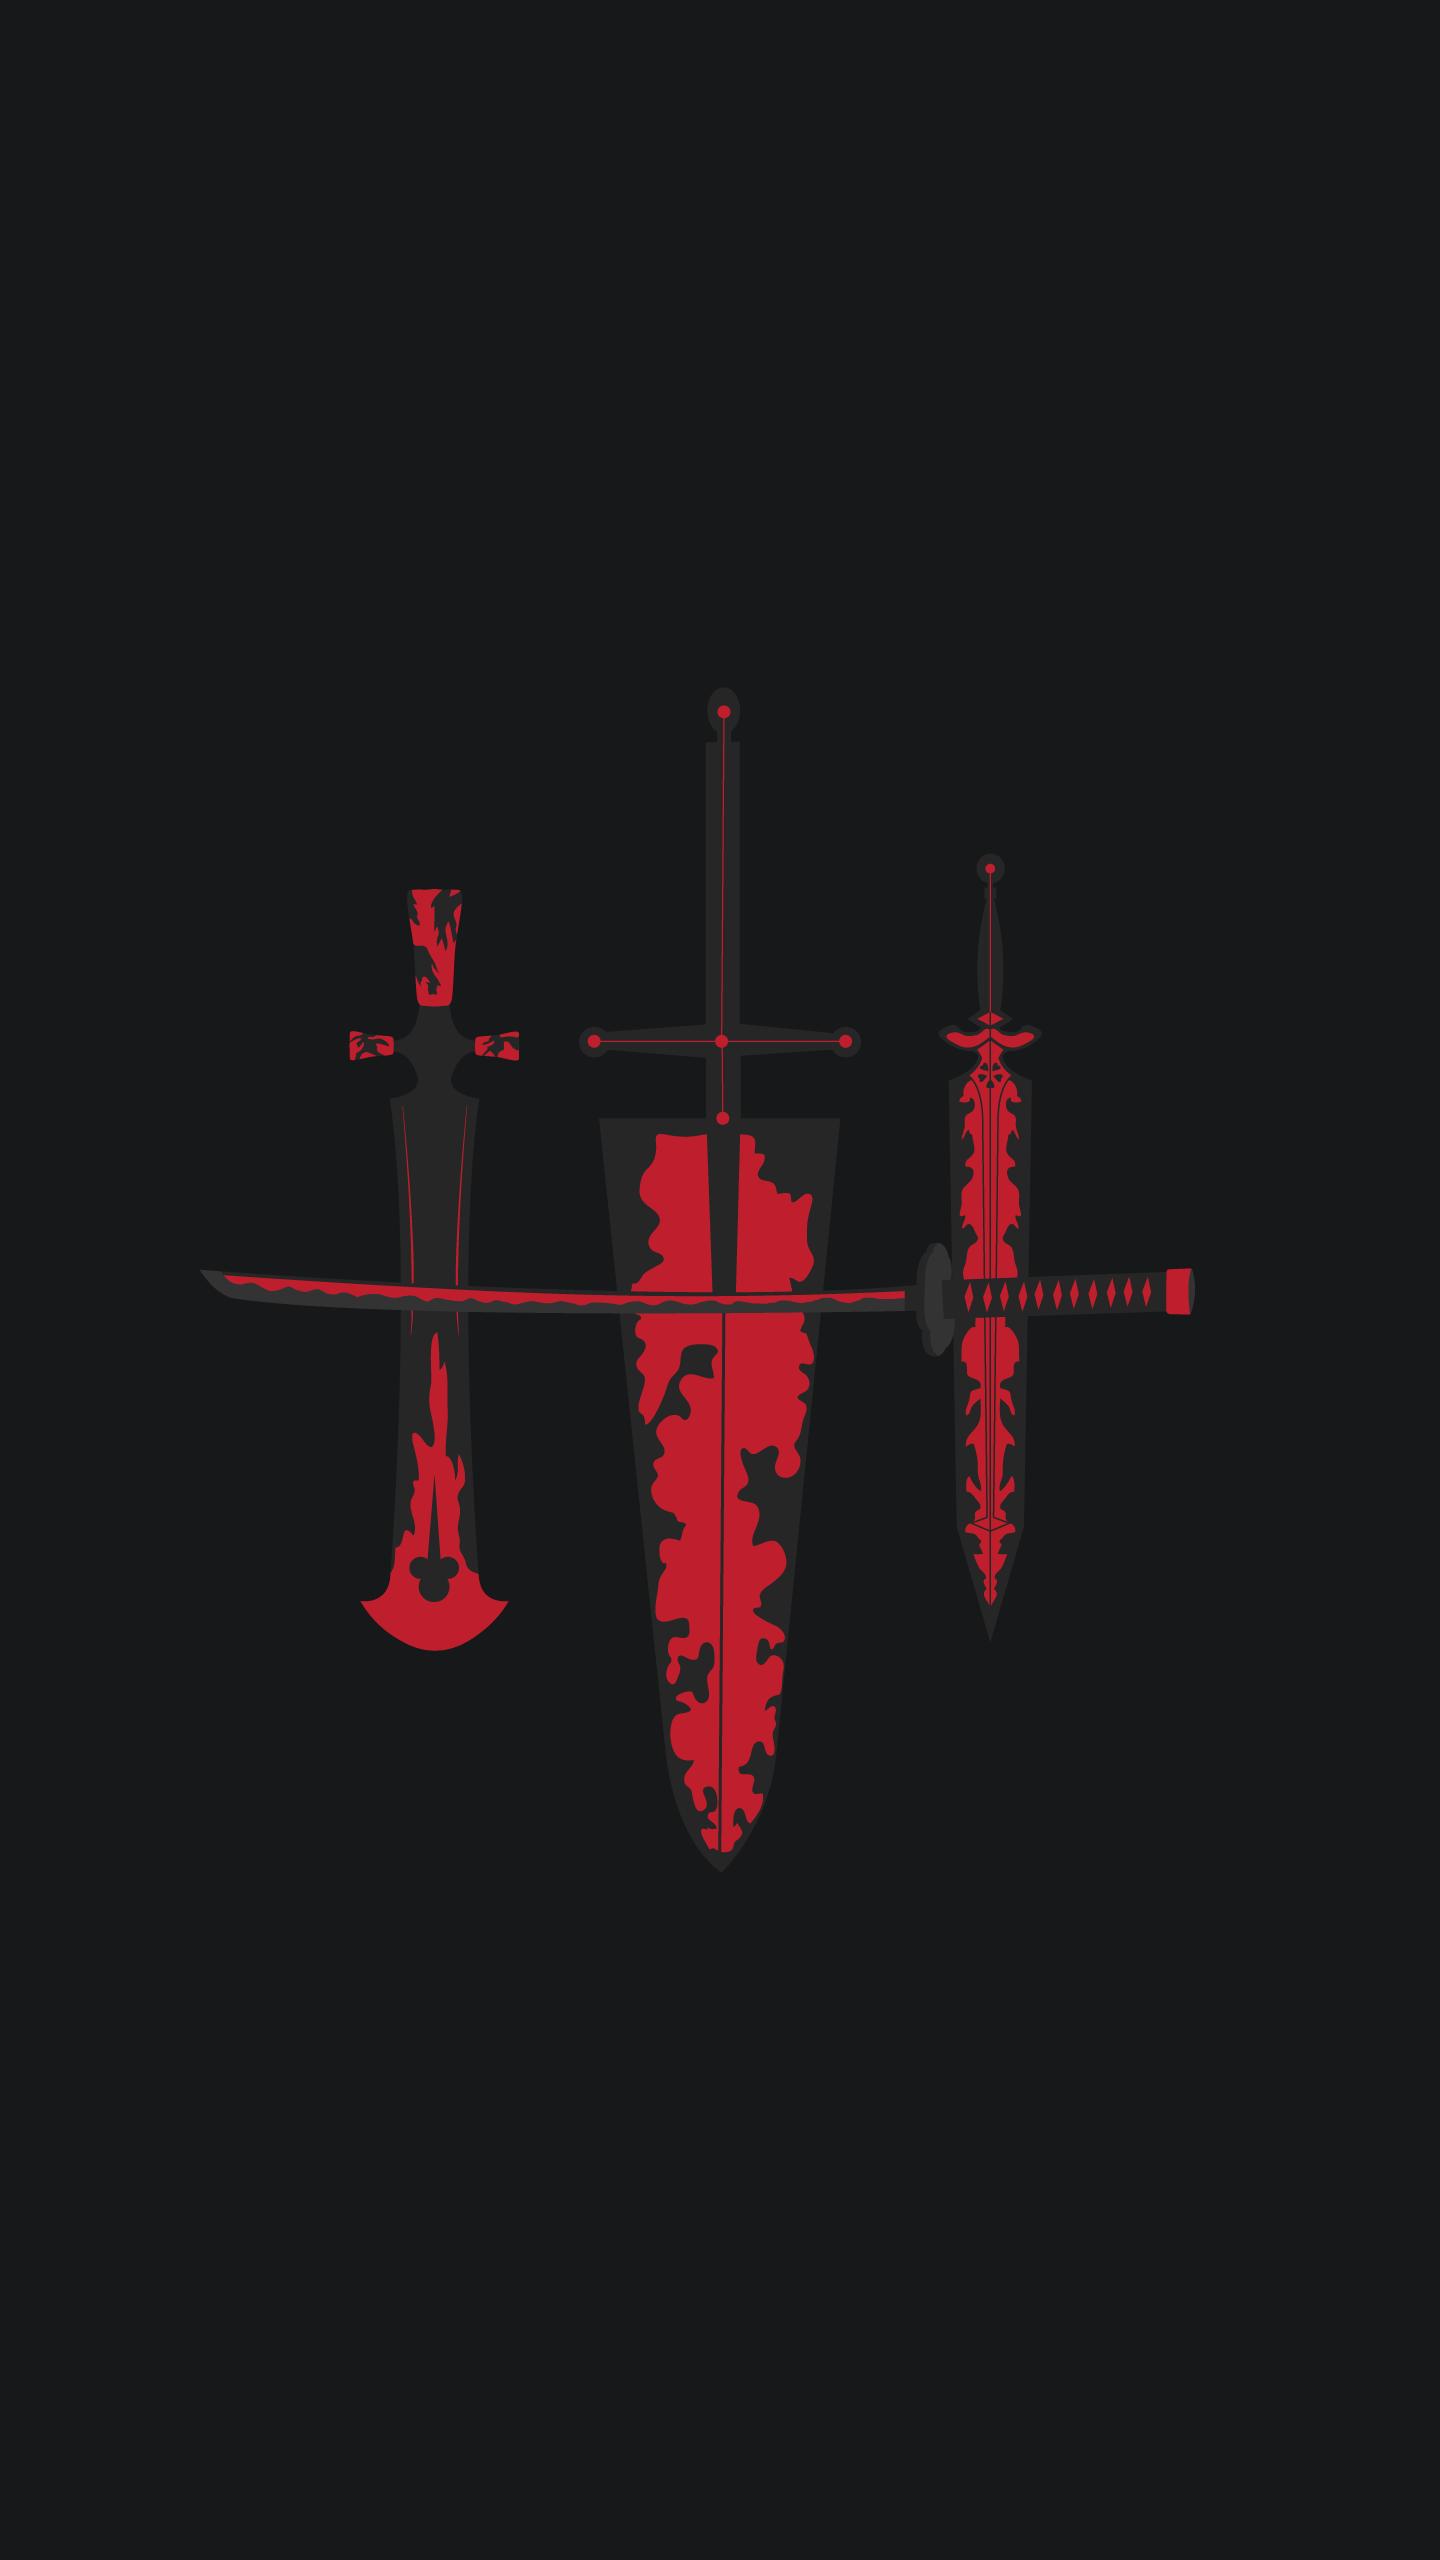 Katana Sword Weapons